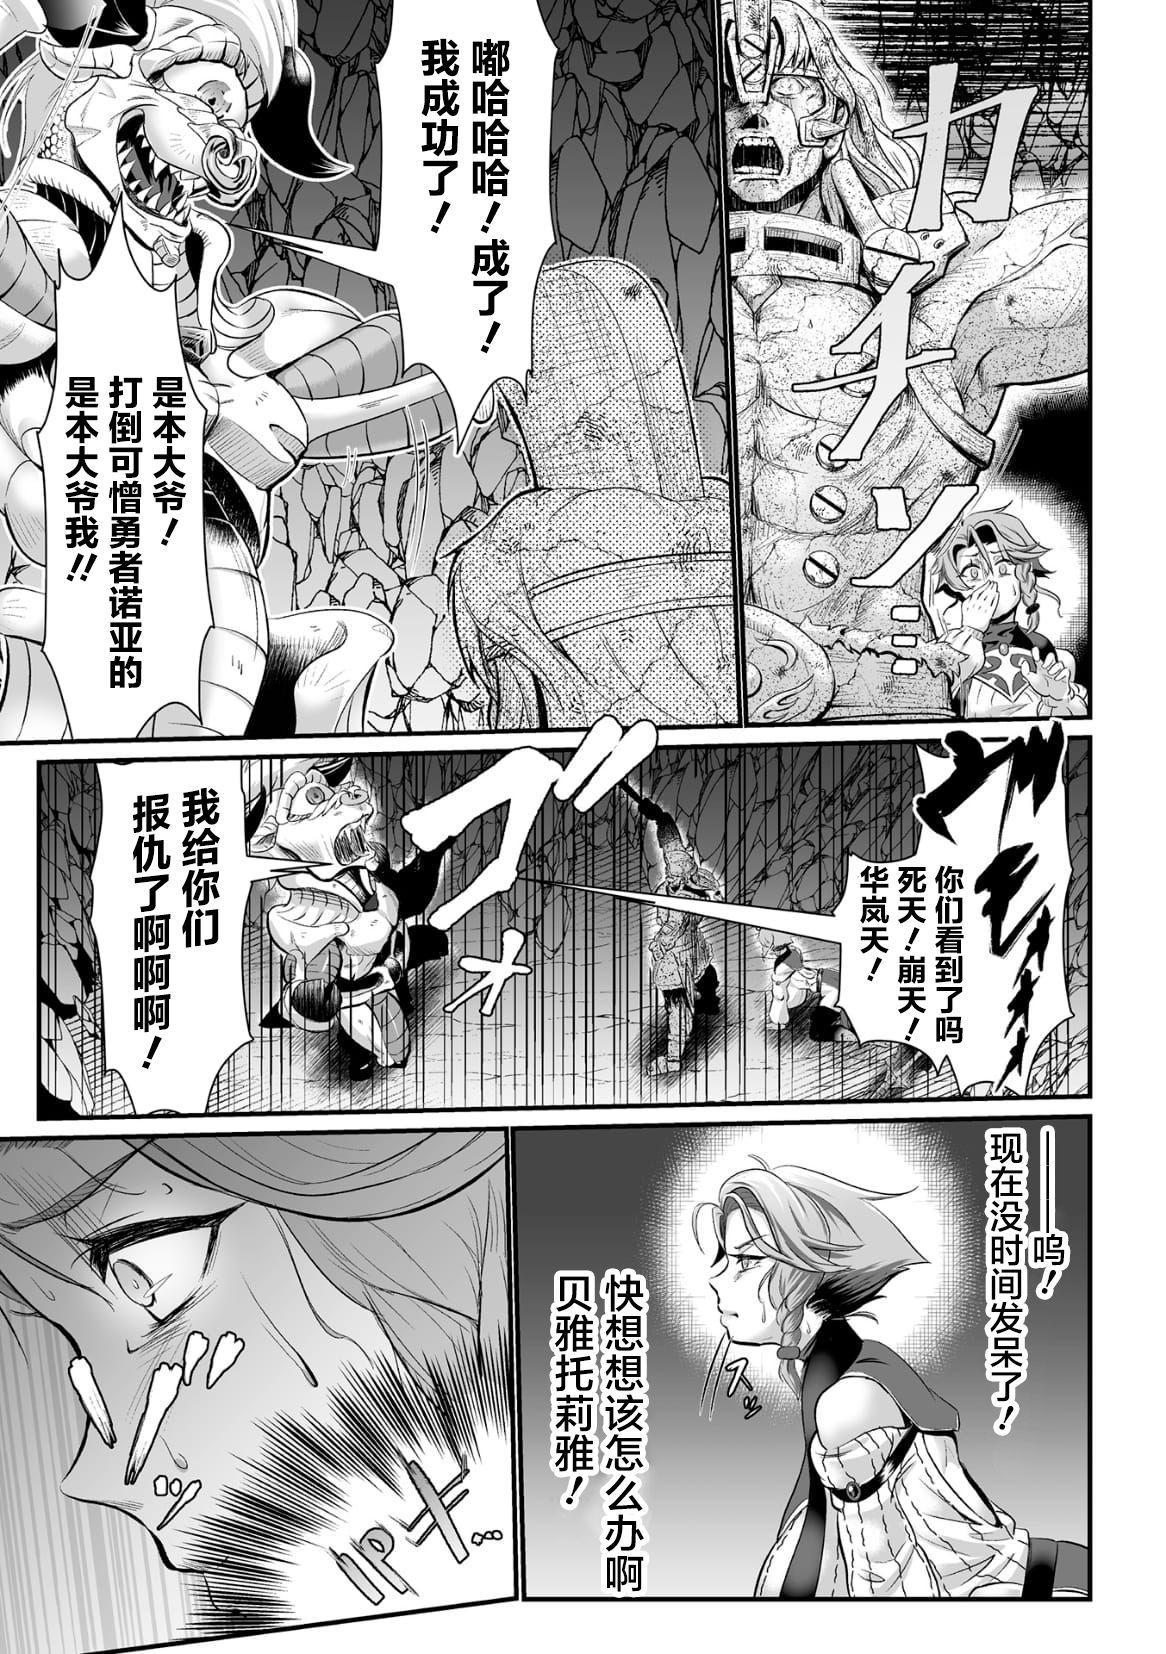 [Mou] Sekkan Fuuin ~Enbi na Sekizou ni Otosareshi Yuusha Ichizoku~ Ch. 1 [Chinese] [不咕鸟汉化组] 4